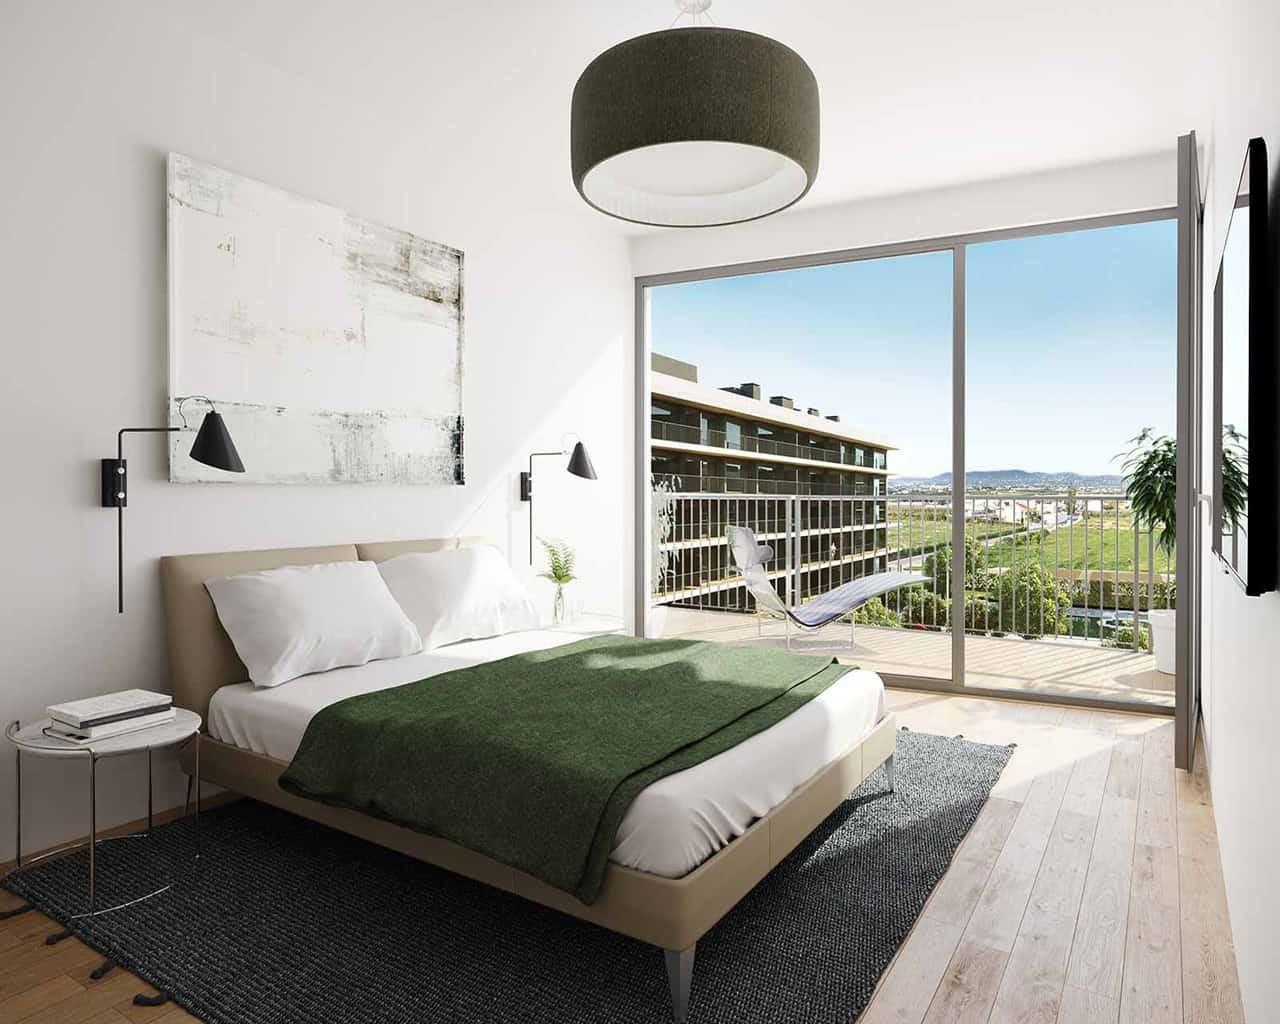 Lux Garden-quarto